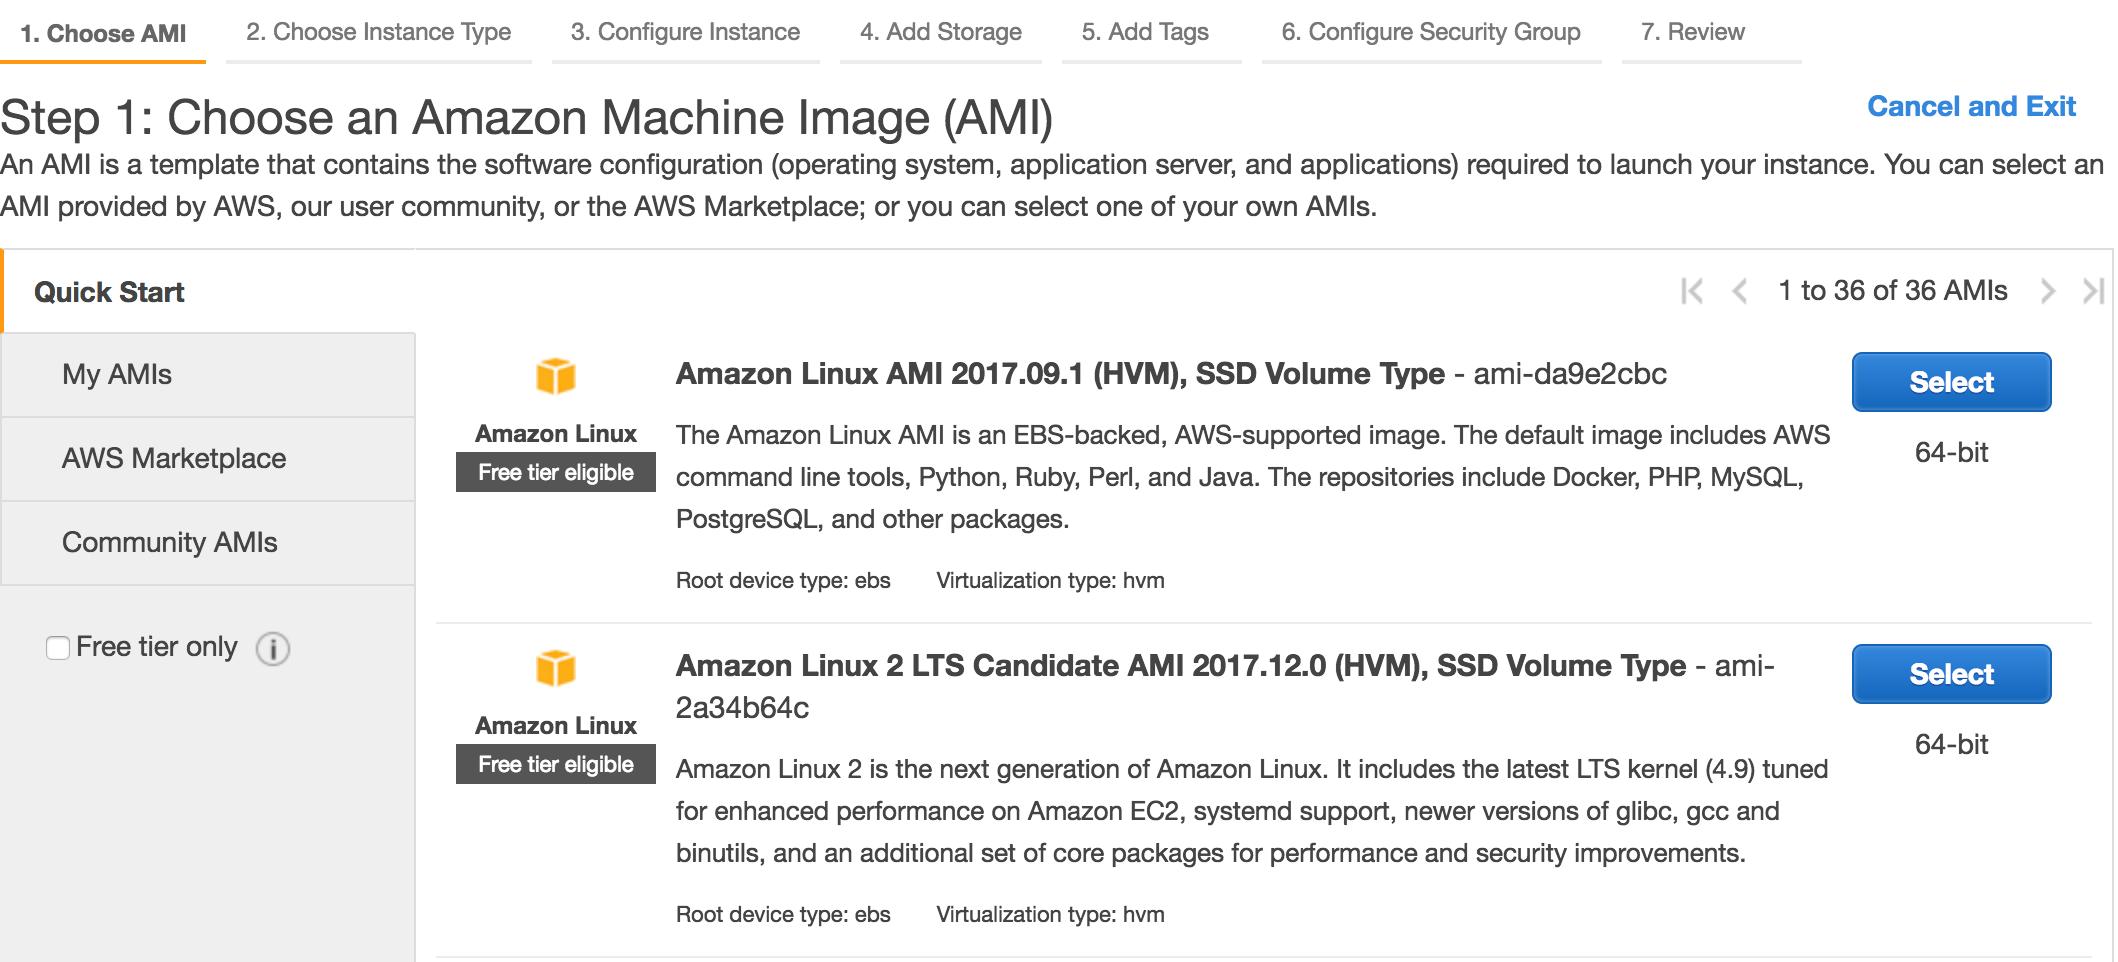 Amazon Linux 2 LTS RC